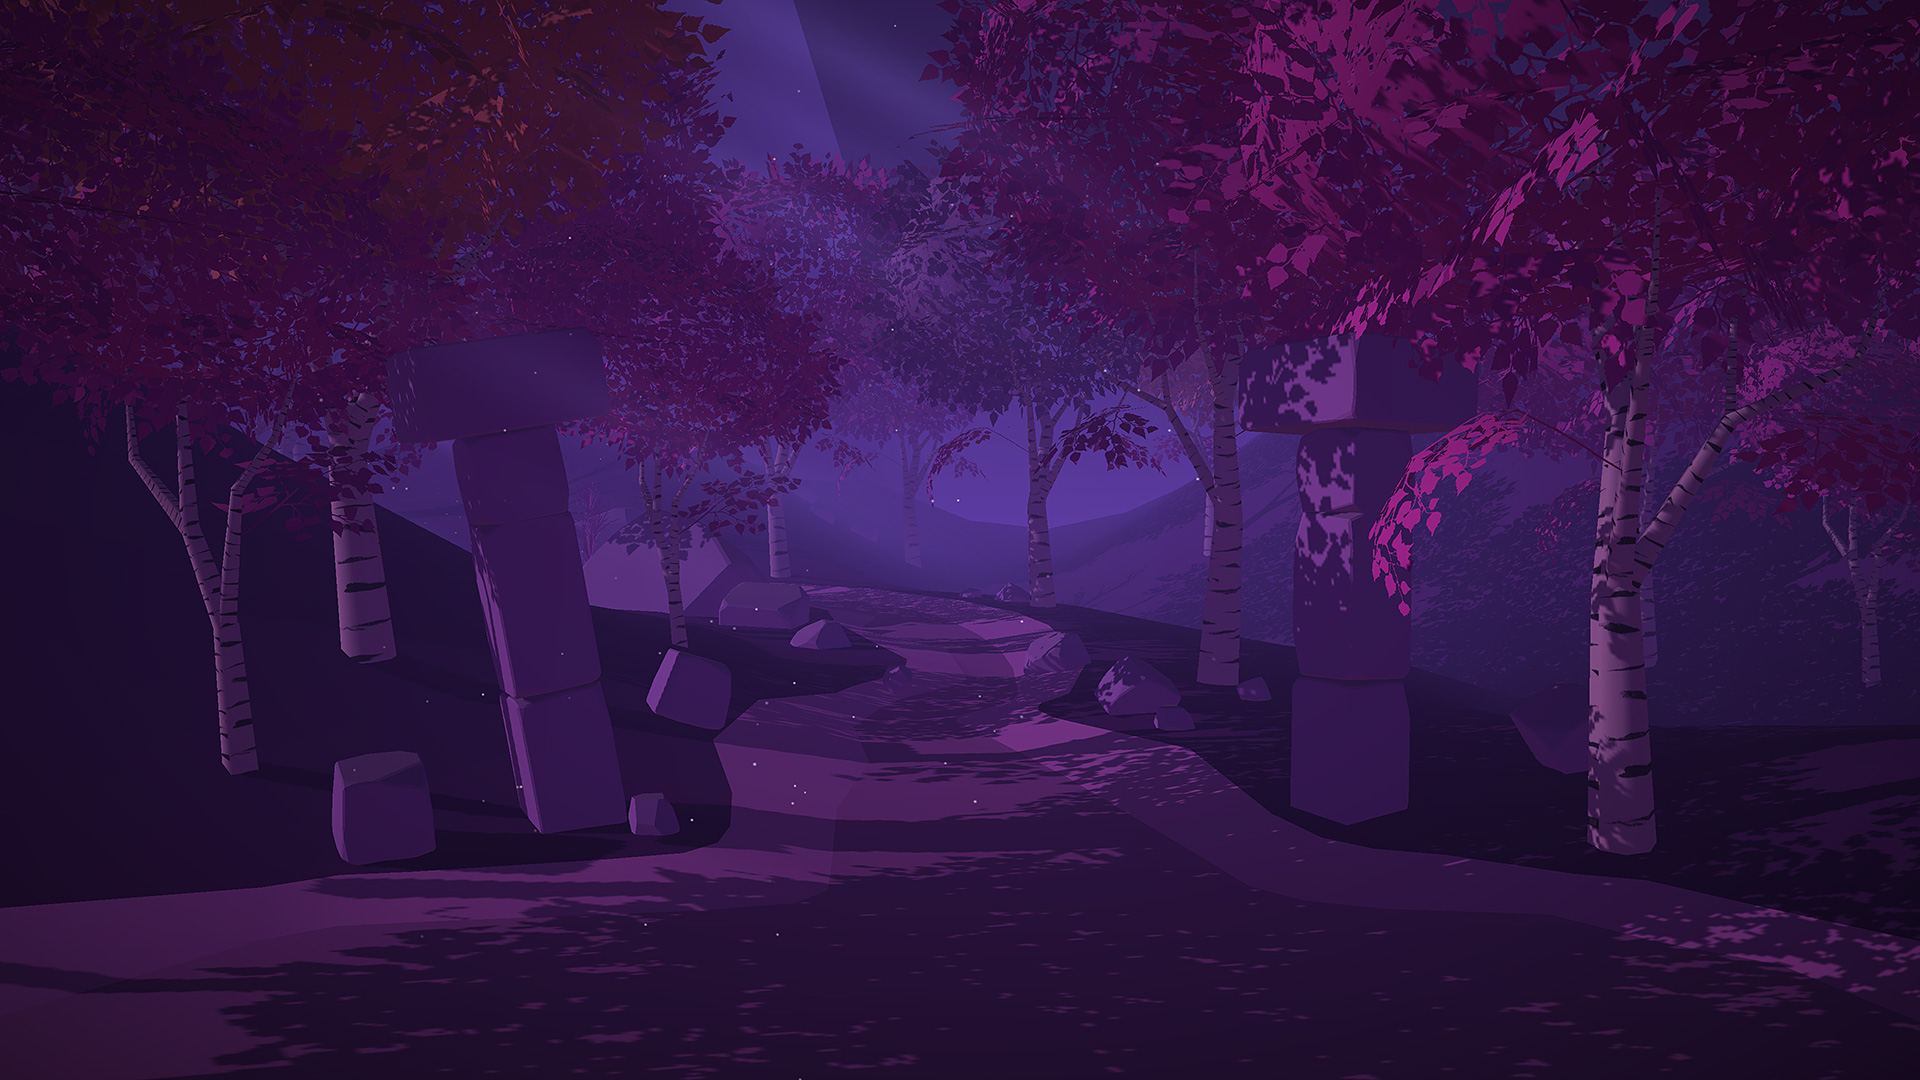 Matkovski Dragos The Nightlight Forest